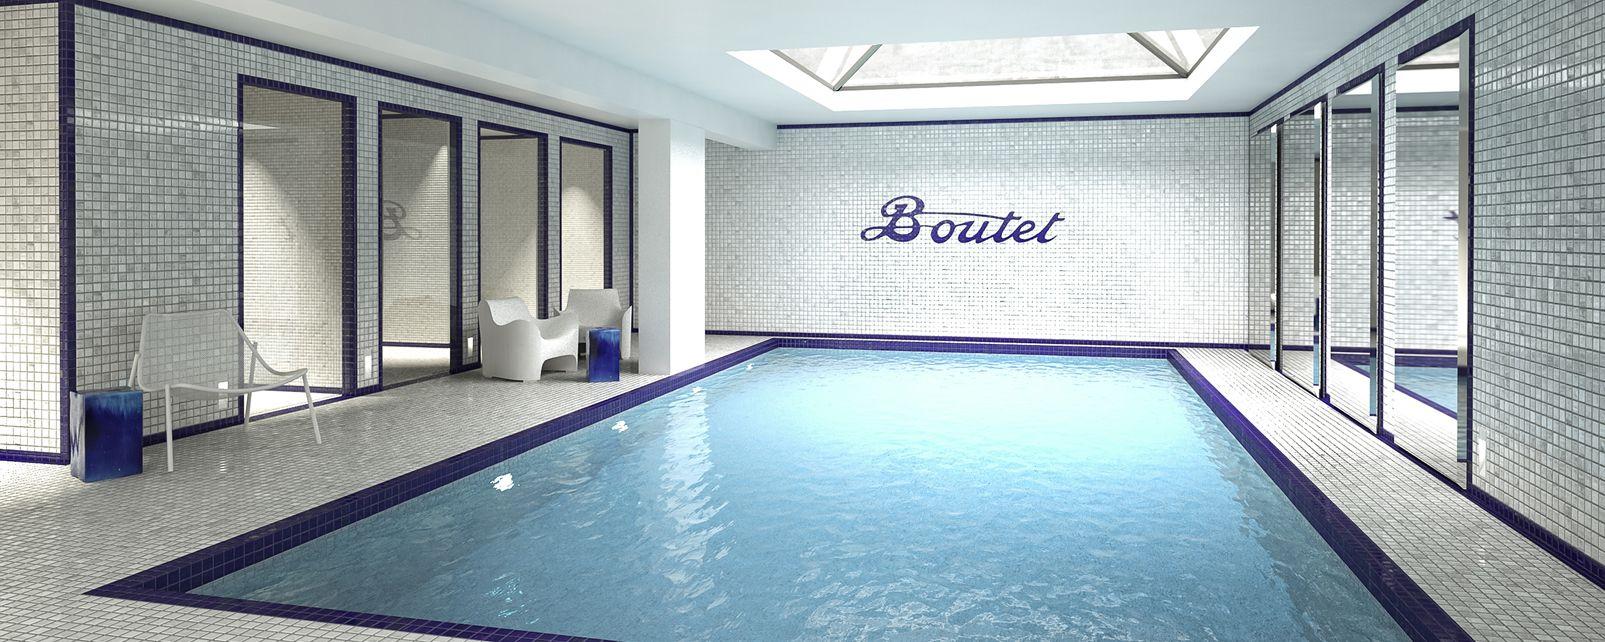 Hôtel MGallery by Sofitel Paris Bastille Boutet